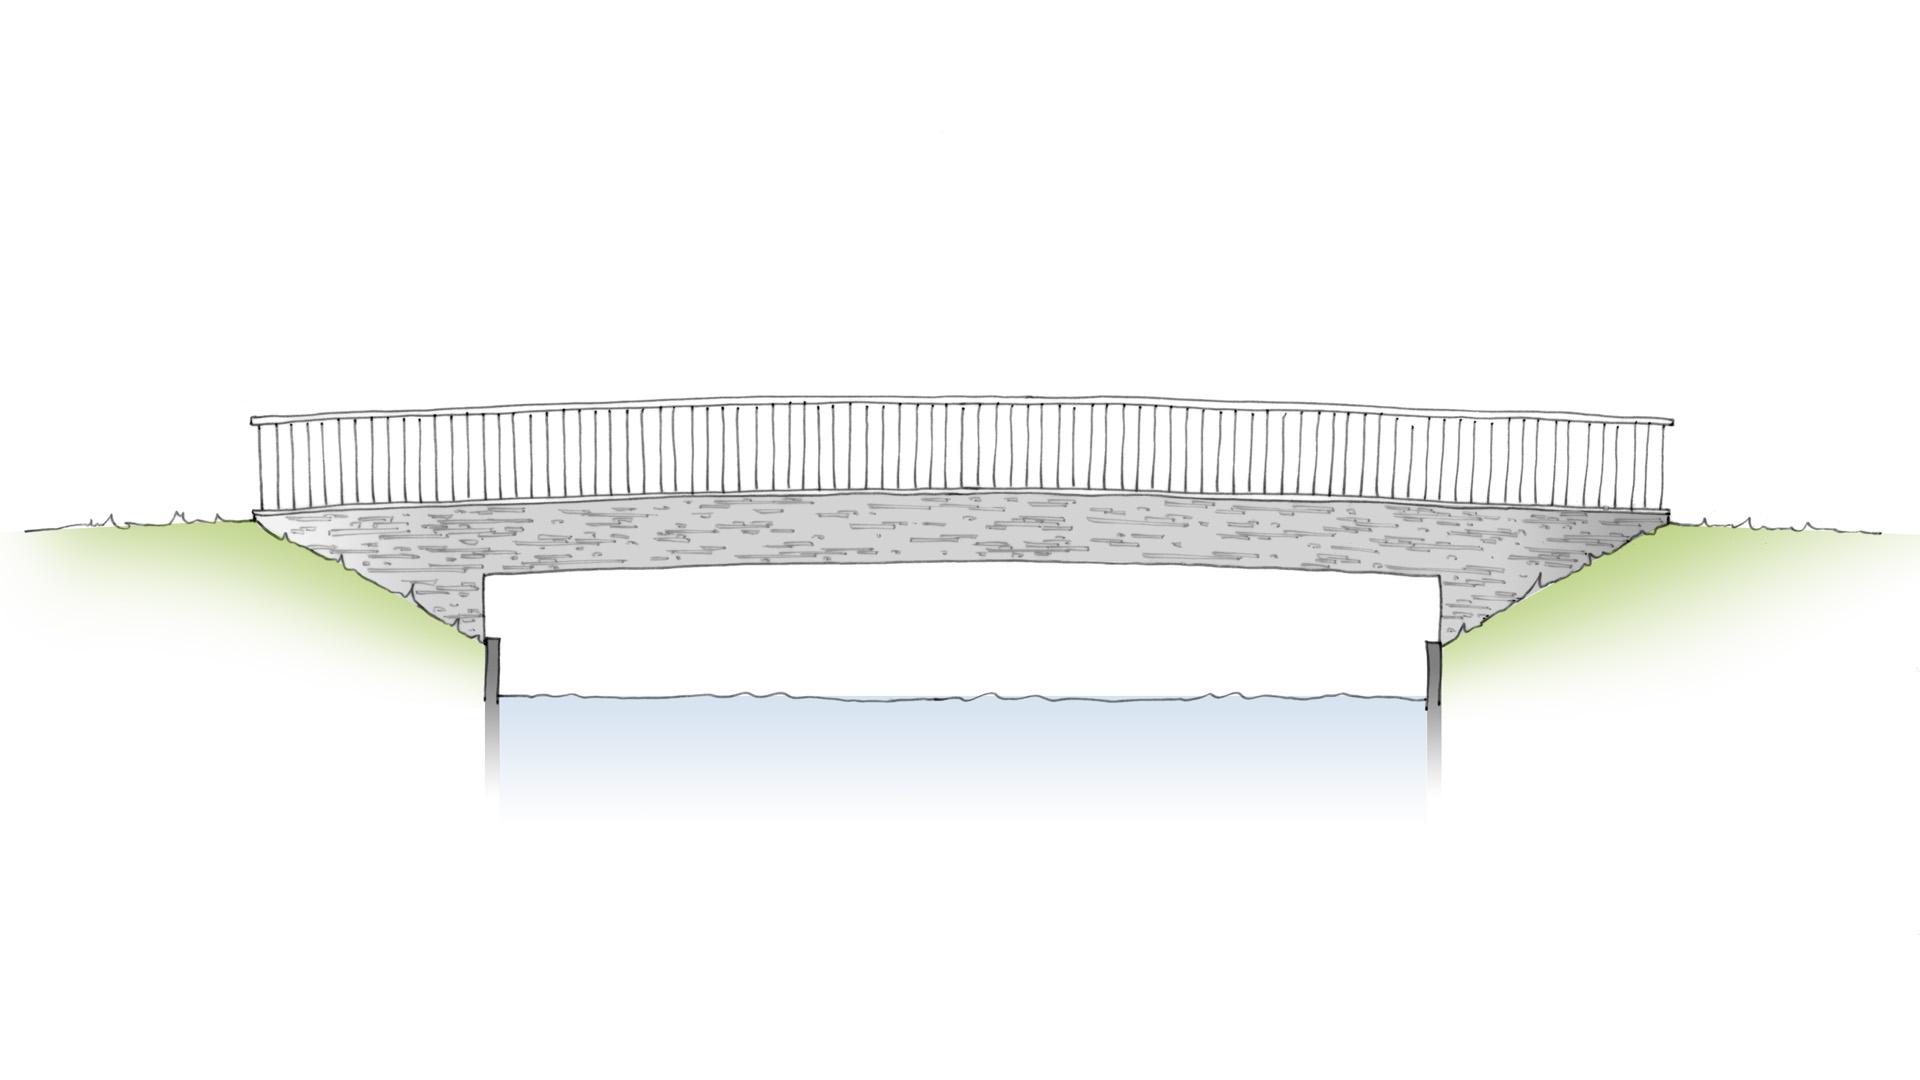 betonnen verkeersbrug De Herven Den Bosch ontwerp ipv Delft